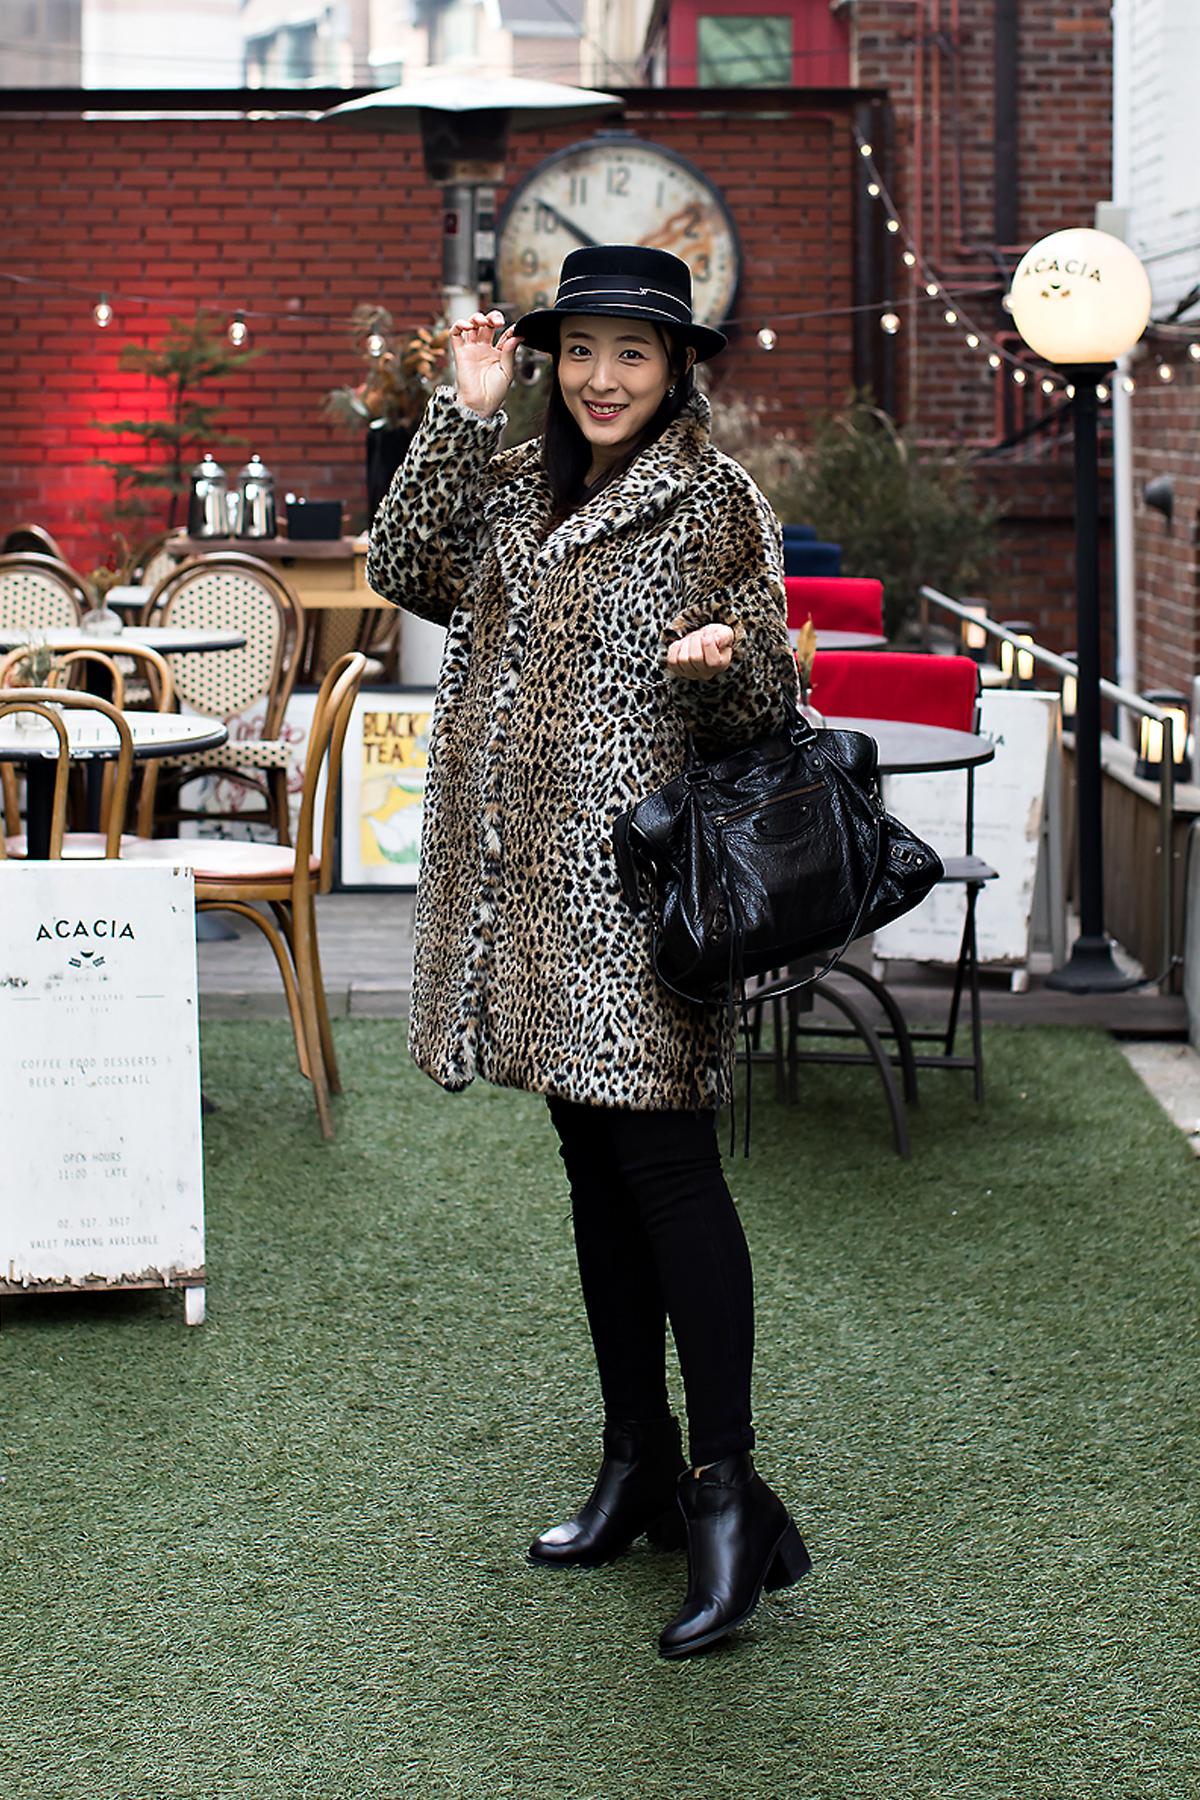 Lee Jihyun, Street Fashion 2017 in SEOUL.jpg